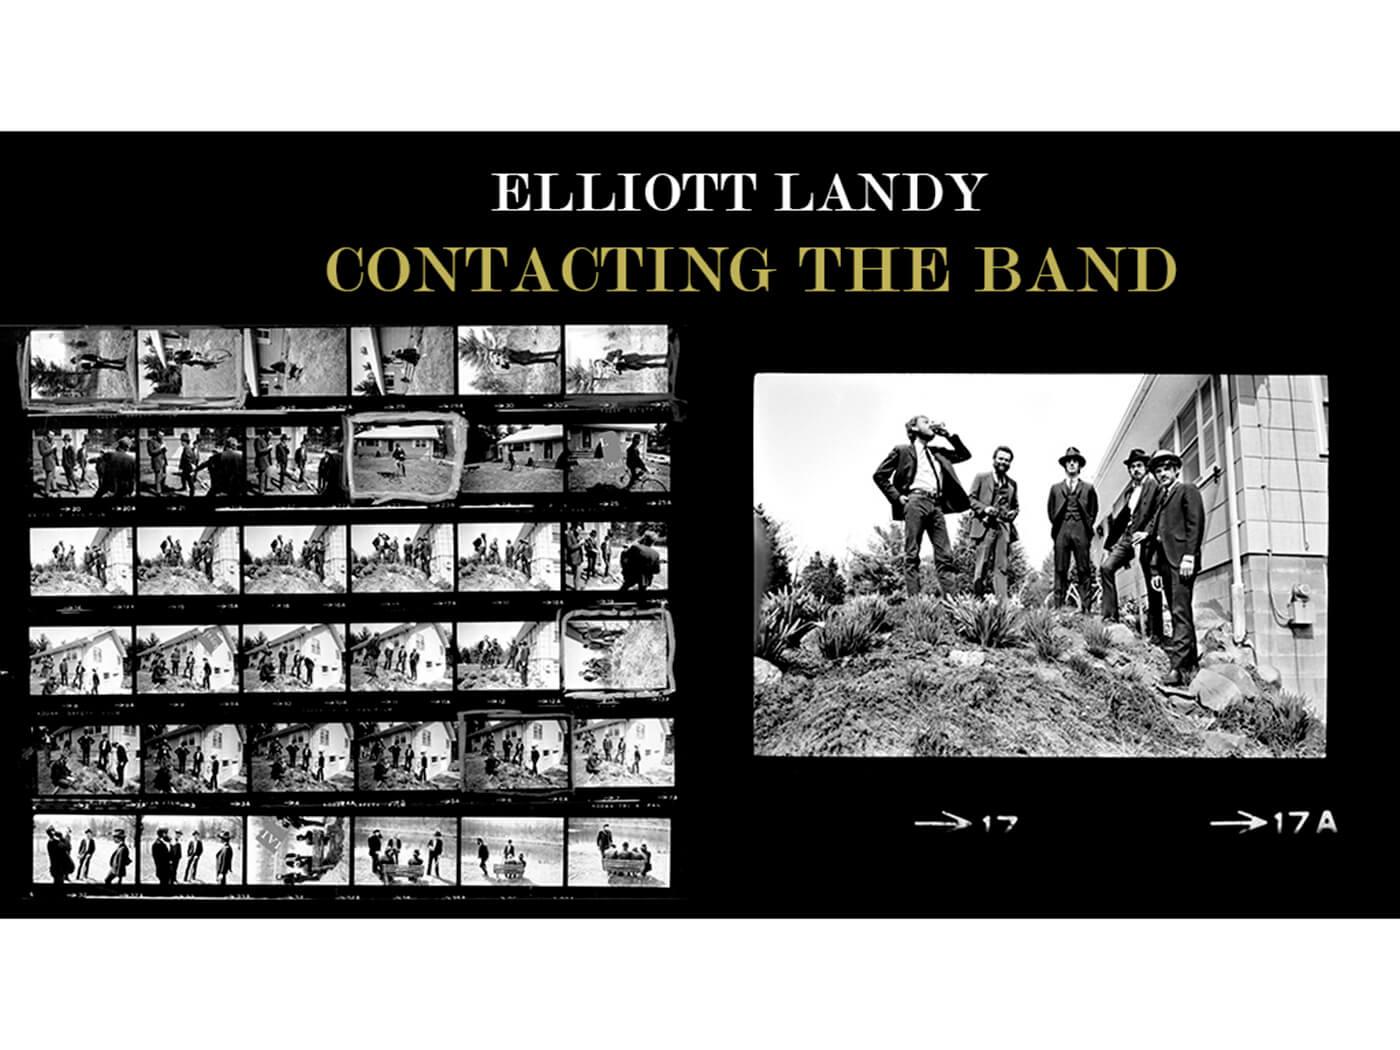 Elliott Landy prepares new photobook about The Band